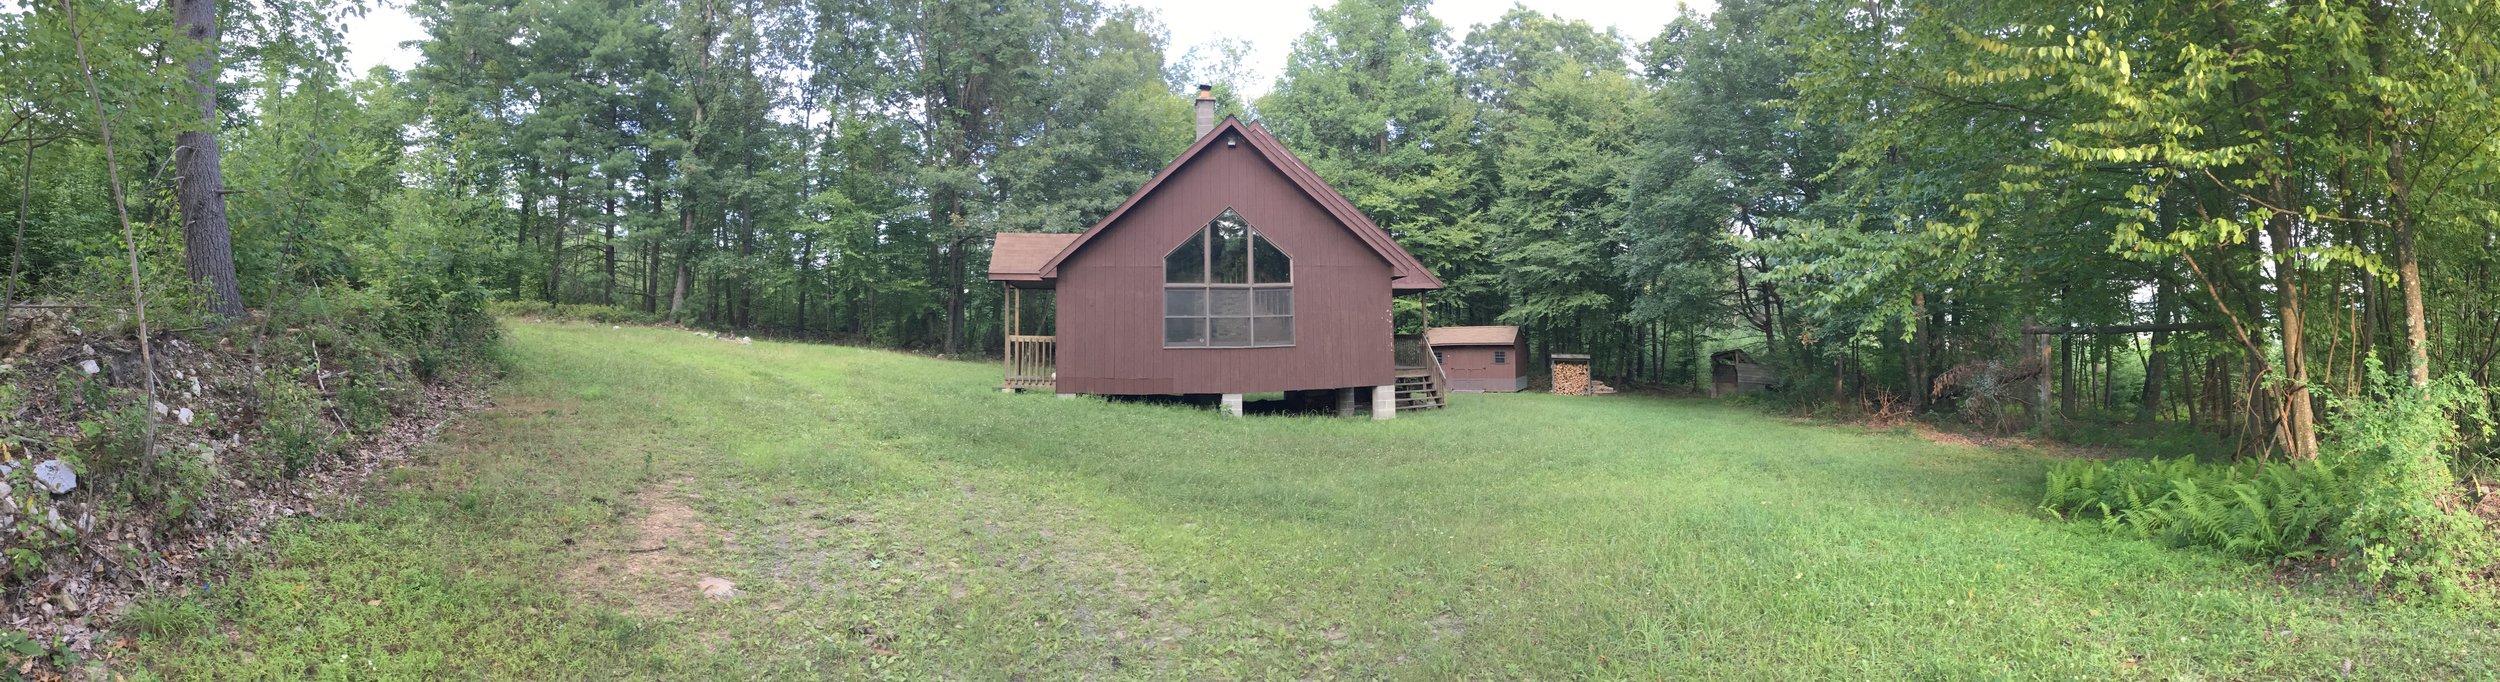 Cabin Panorama (cropped).jpg